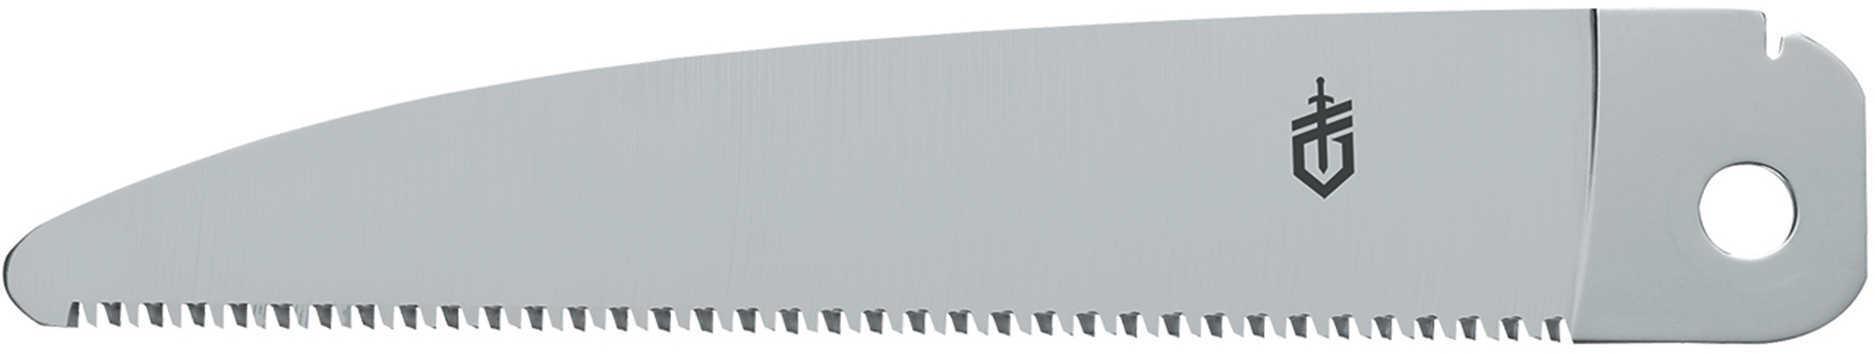 Gerber Exchange-A-Blade Fine/Bone Replacement Blade Md: 22-41461